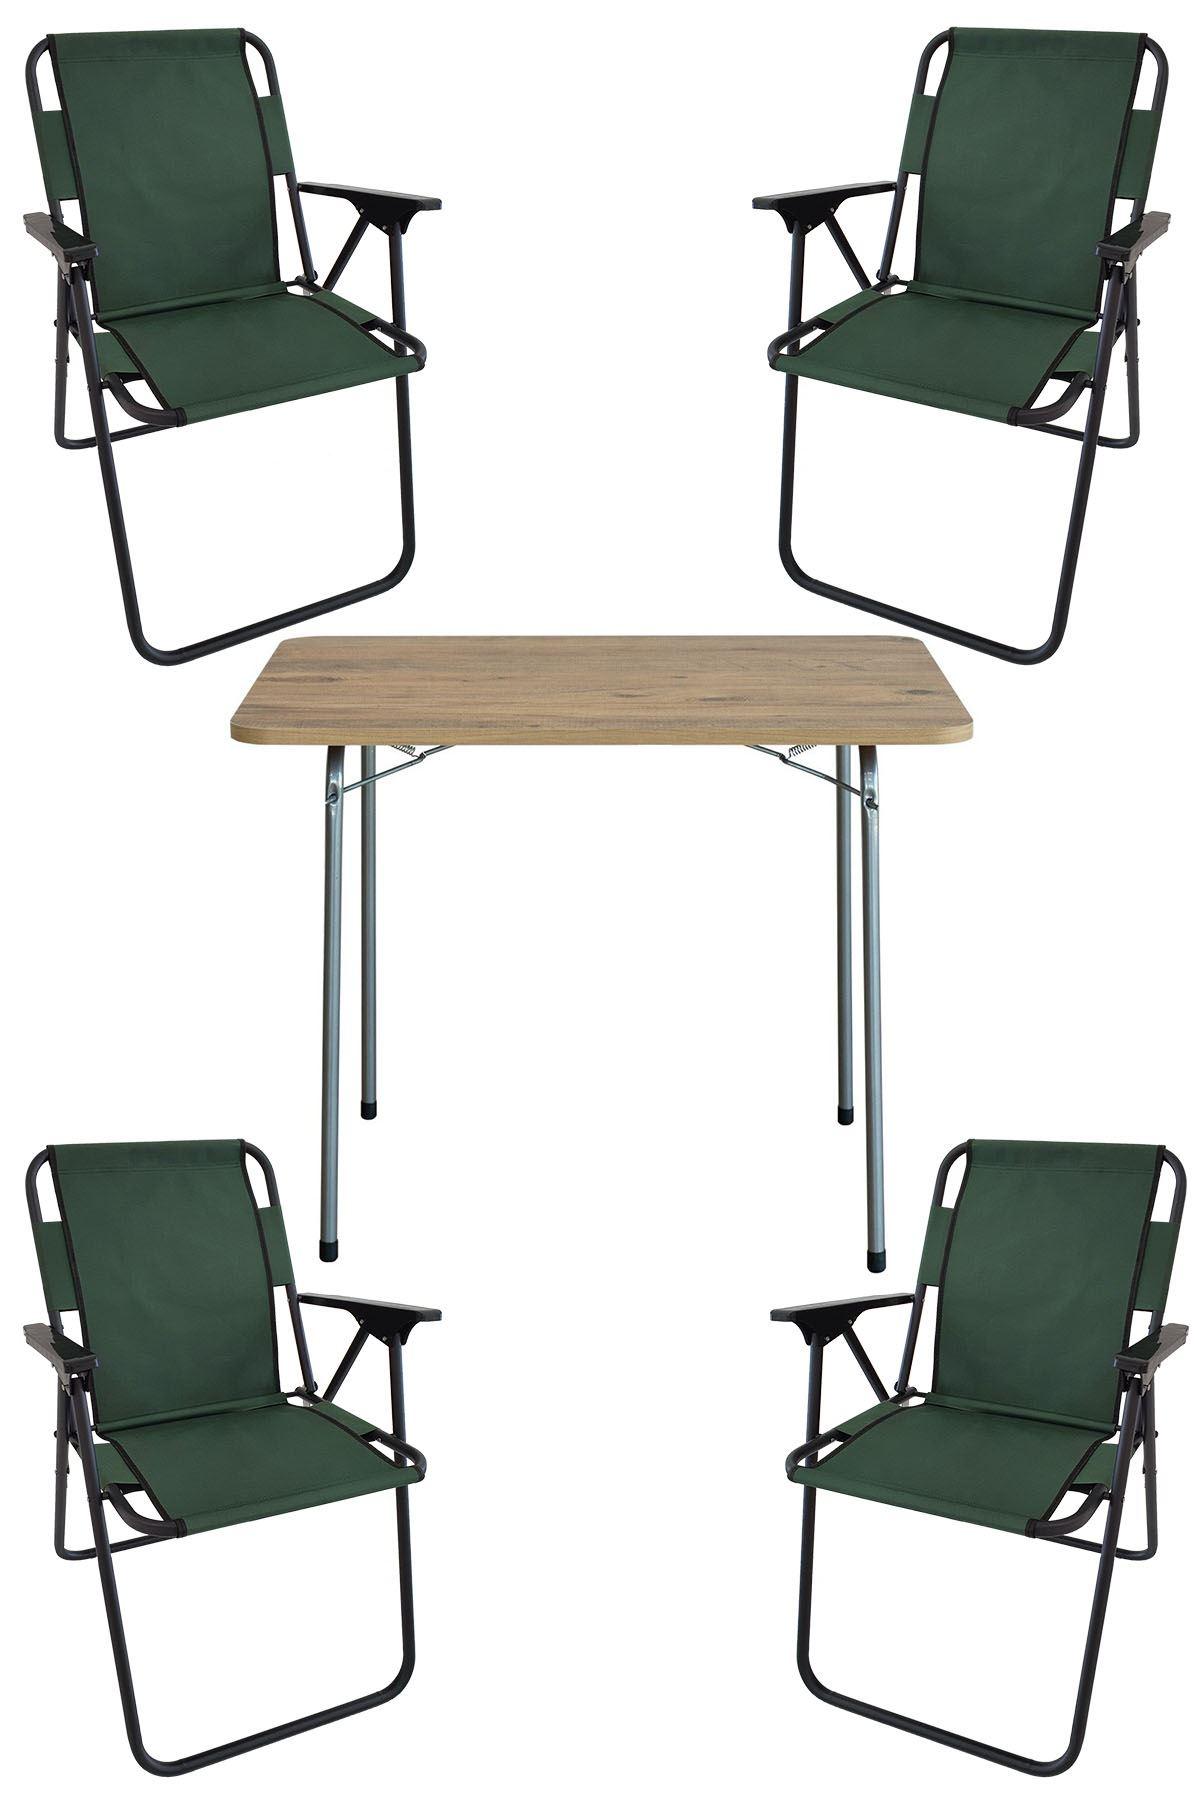 Bofigo 60X80 Pine Patterned Folding Table + 4 Pieces Folding Chair Camping Set Garden Set Green